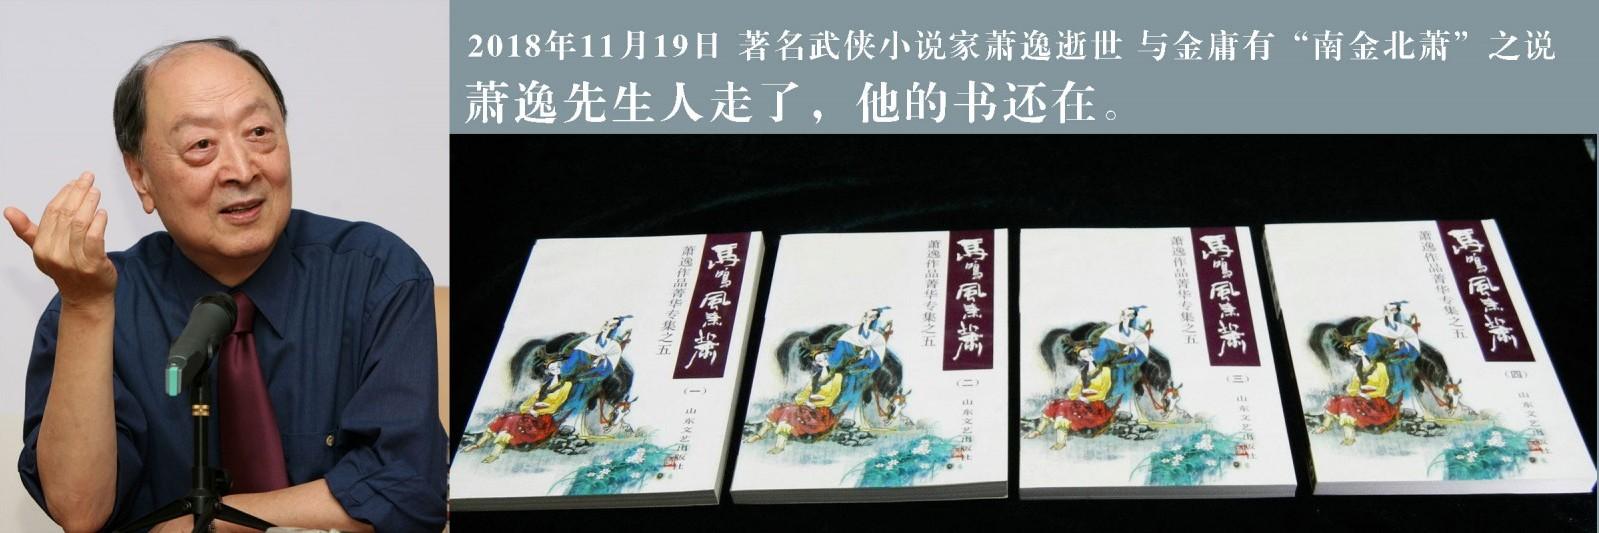 http://book.kongfz.com/115322/701657405/